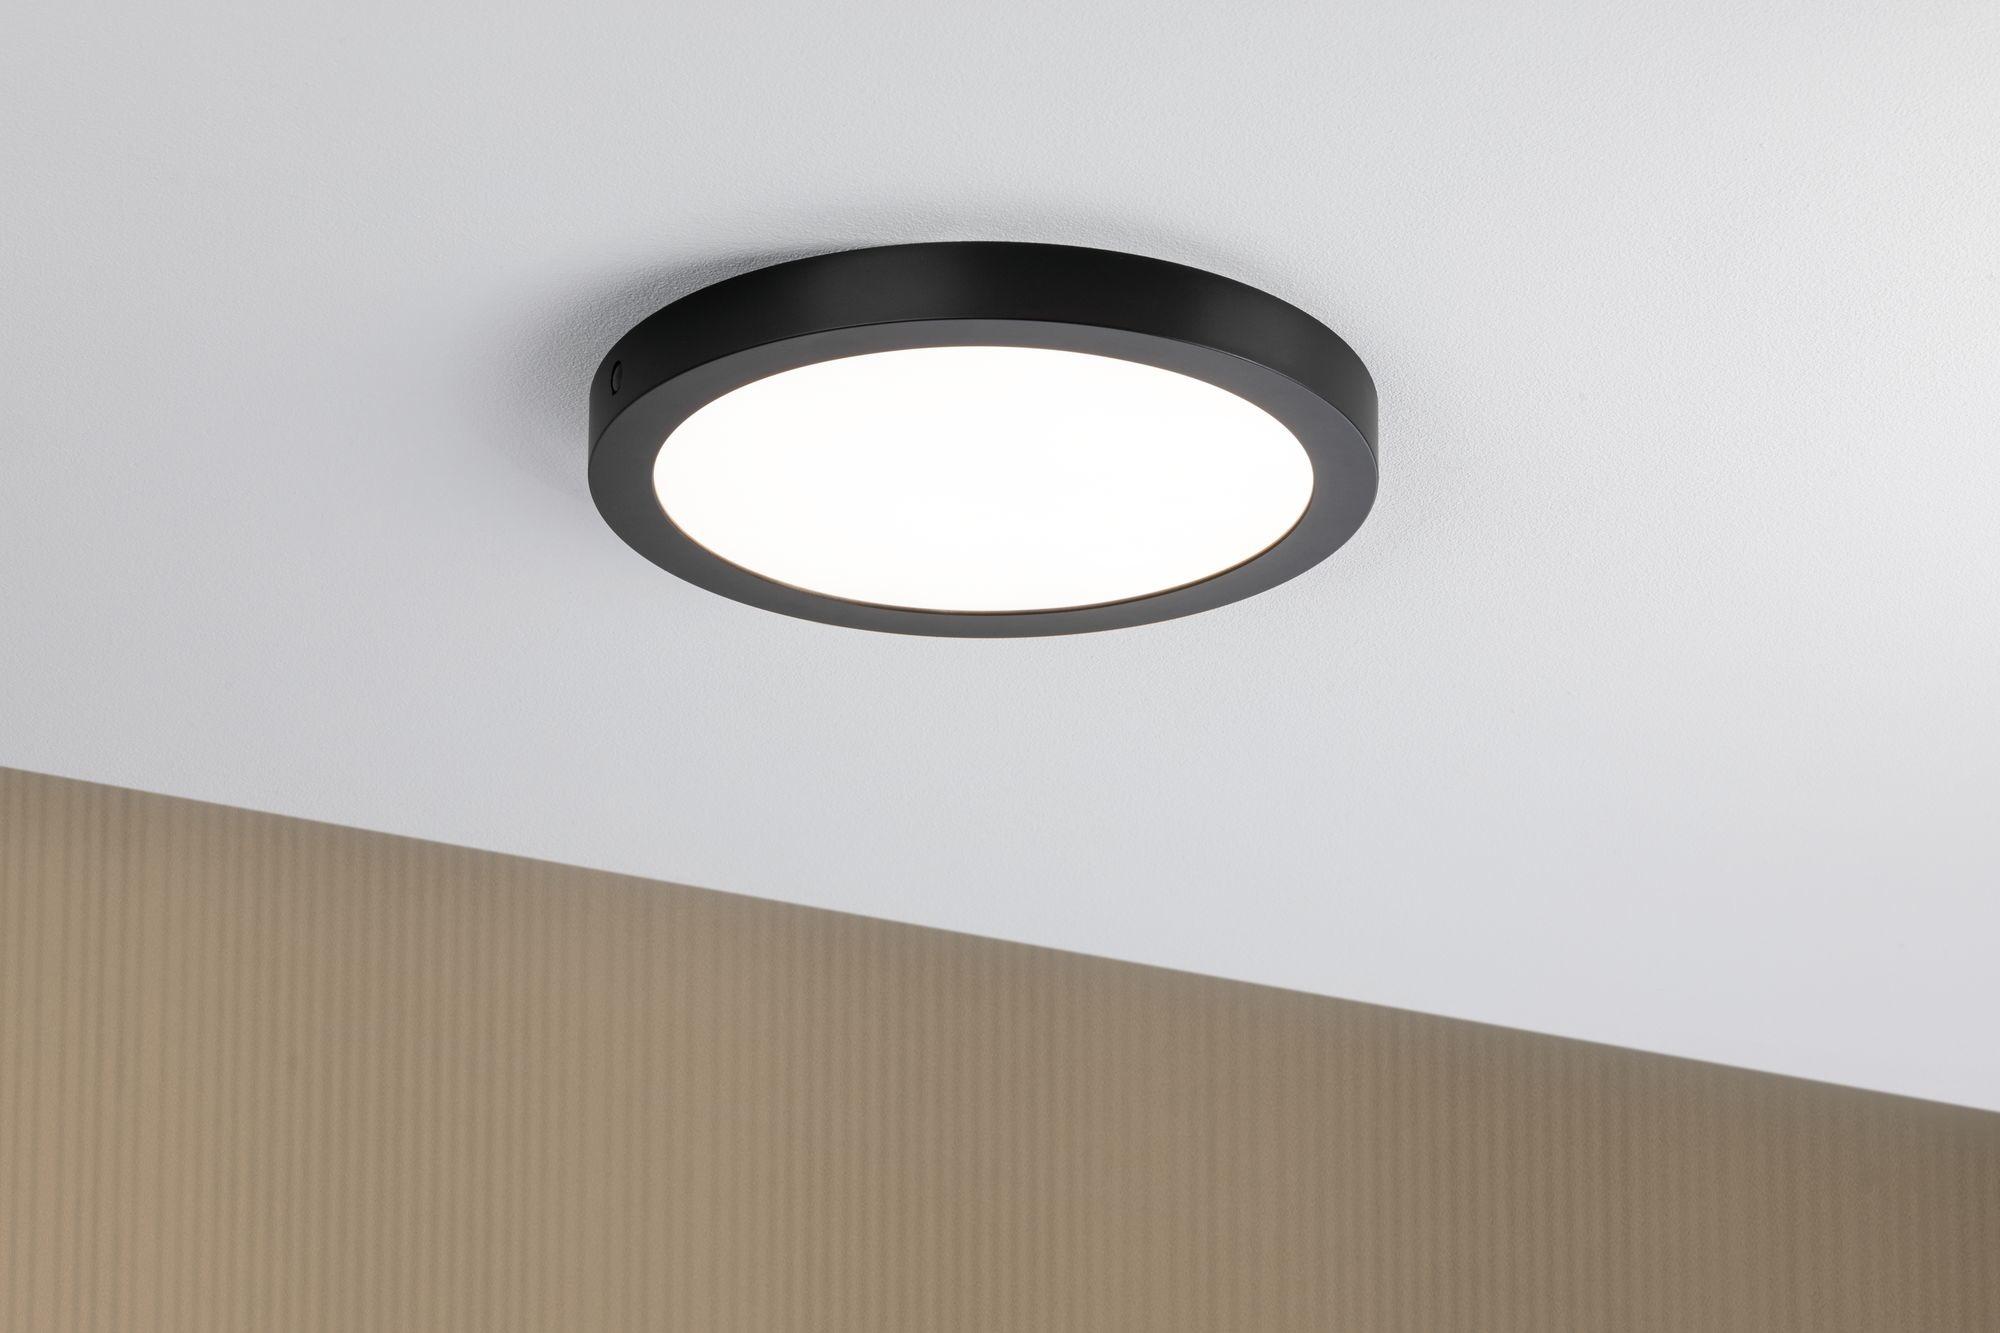 Paulmann LED Panel Abia rund 300mm 22W 2.700K Schwarz matt